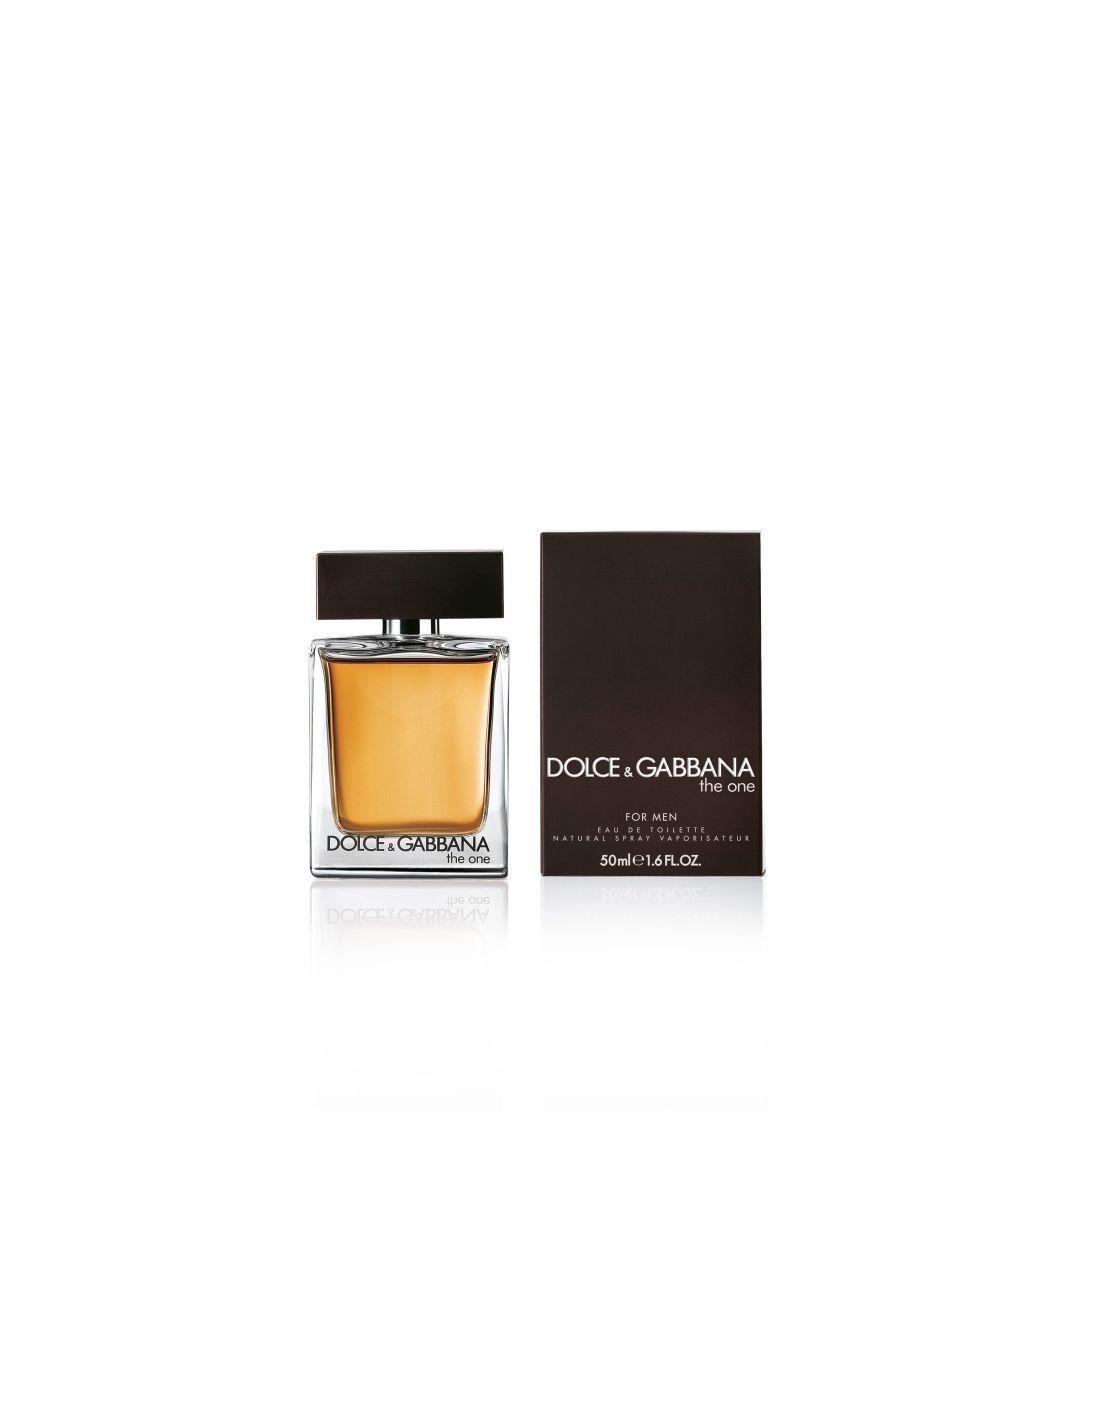 934c4fed14510c Perfume The One Men Eau de Toilette 50 ml - Perfumes 24 ®